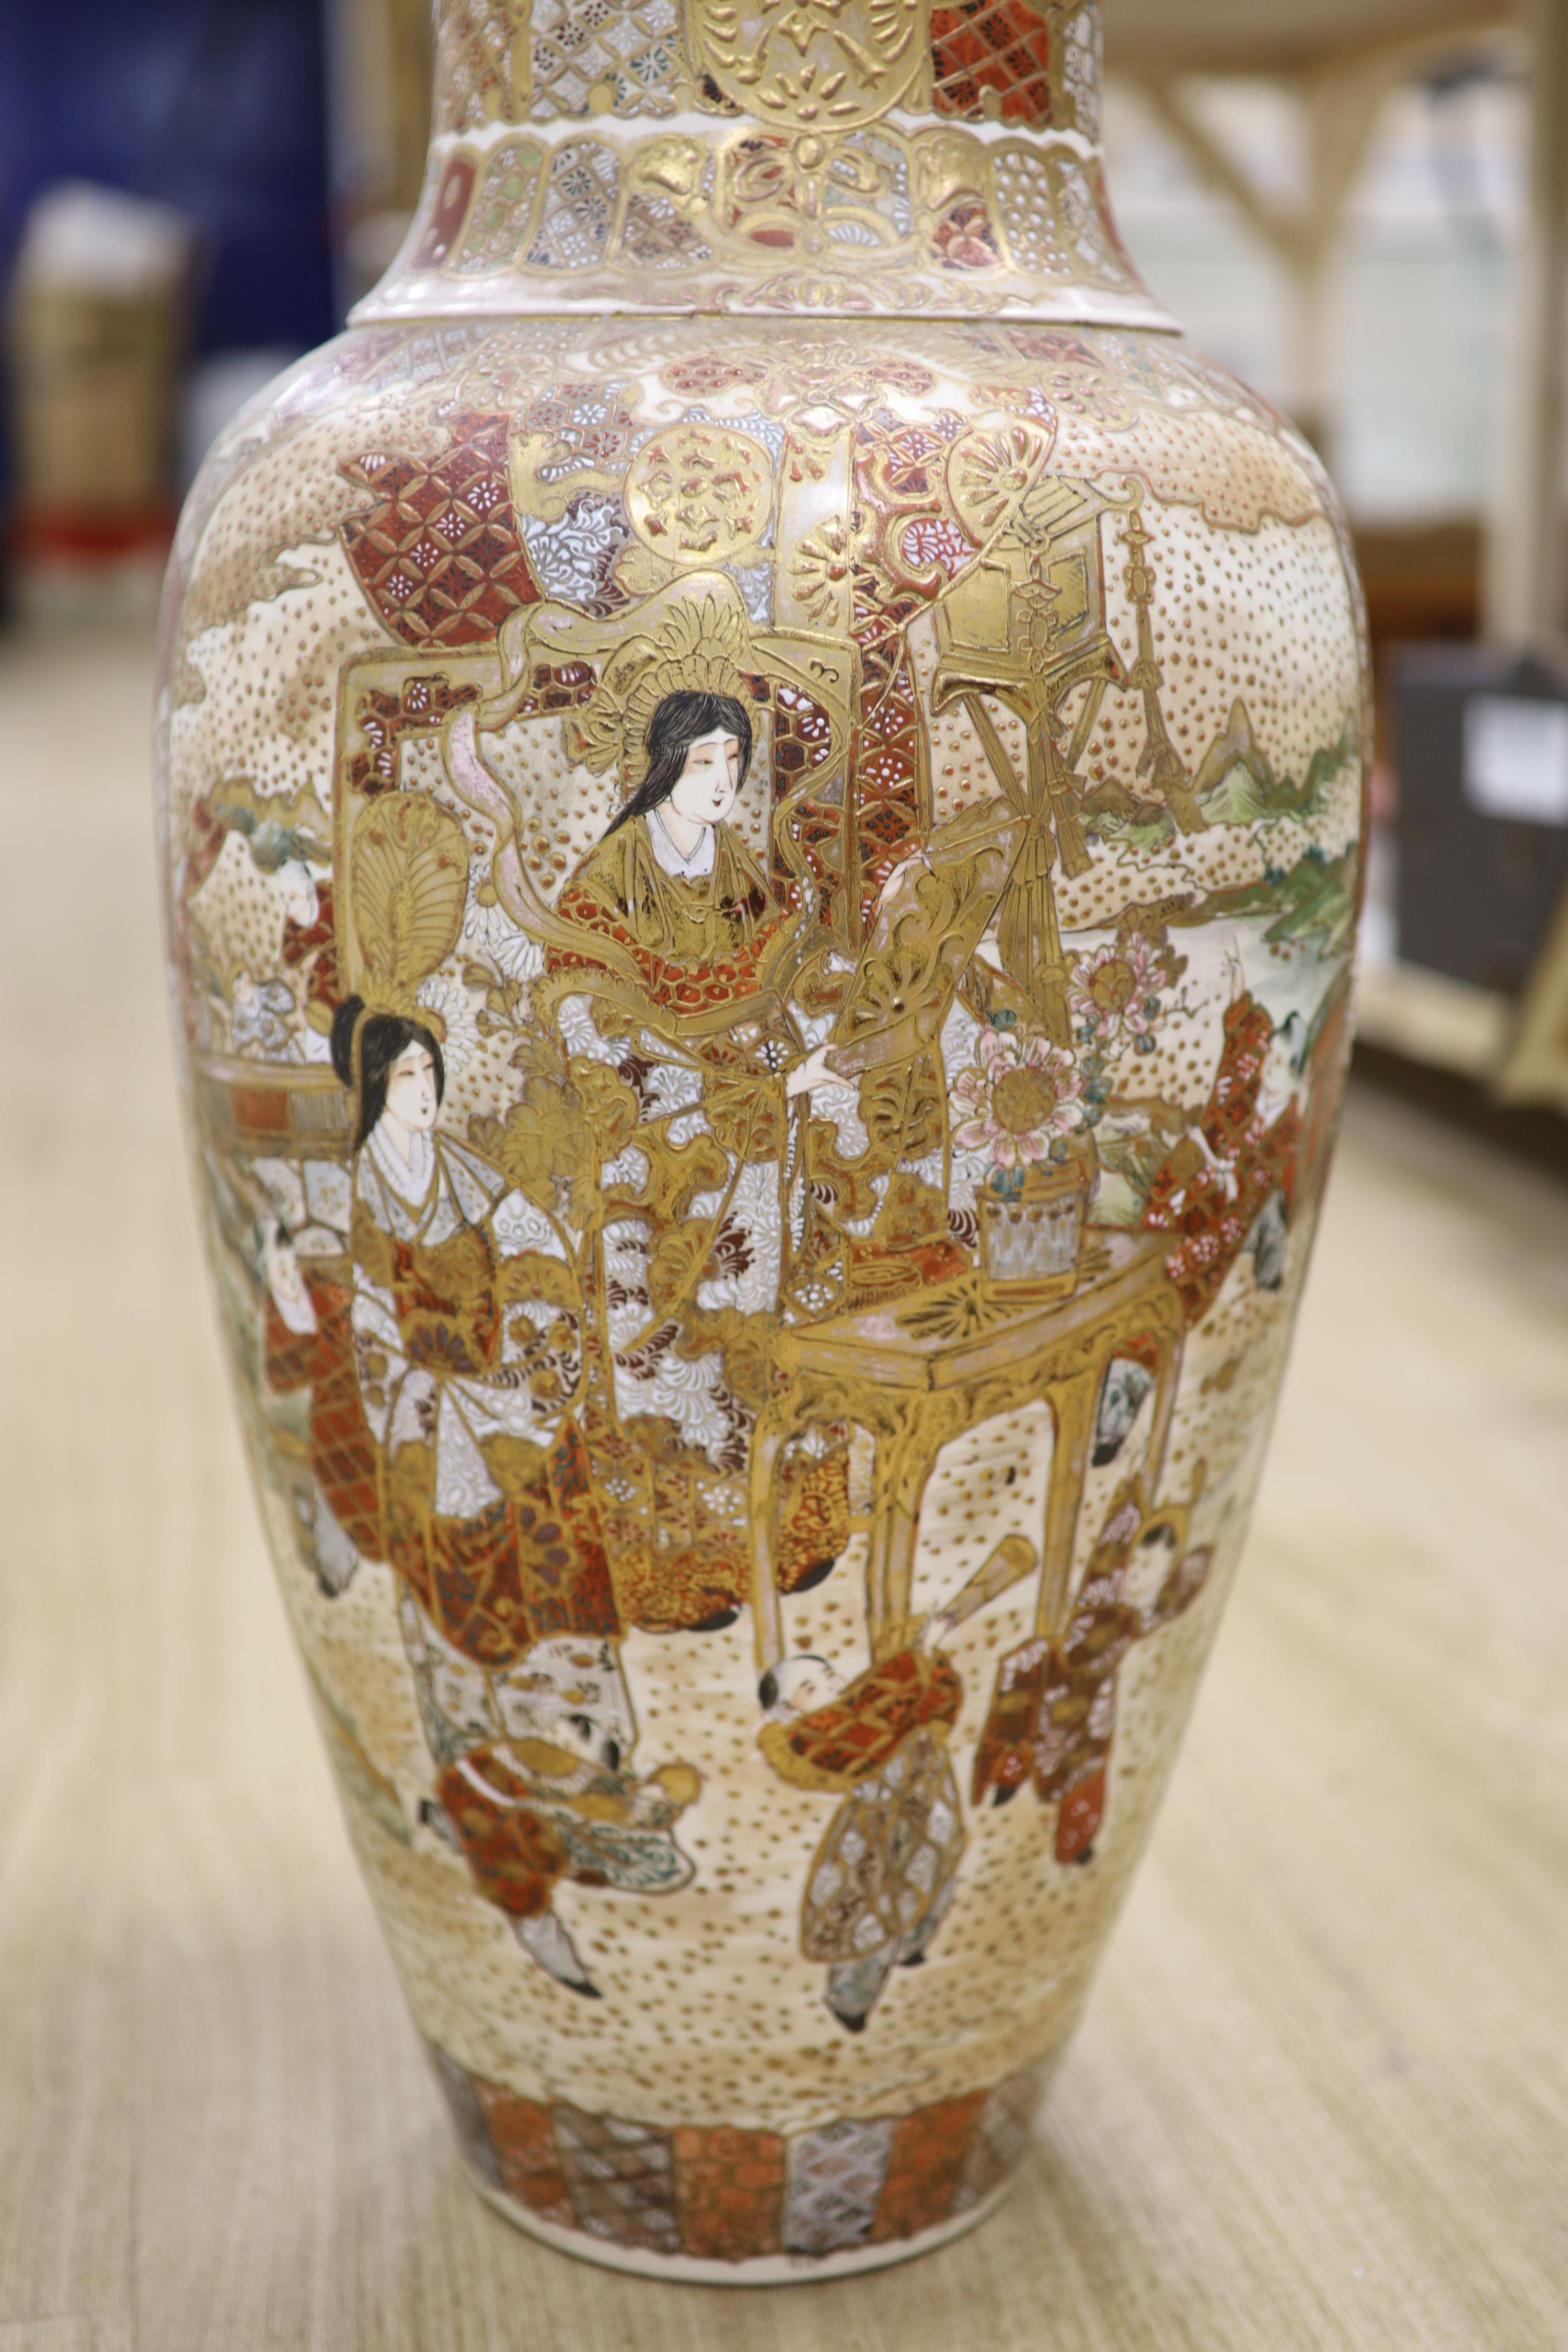 A large Satsuma pottery vase, height 63cm - Image 2 of 8